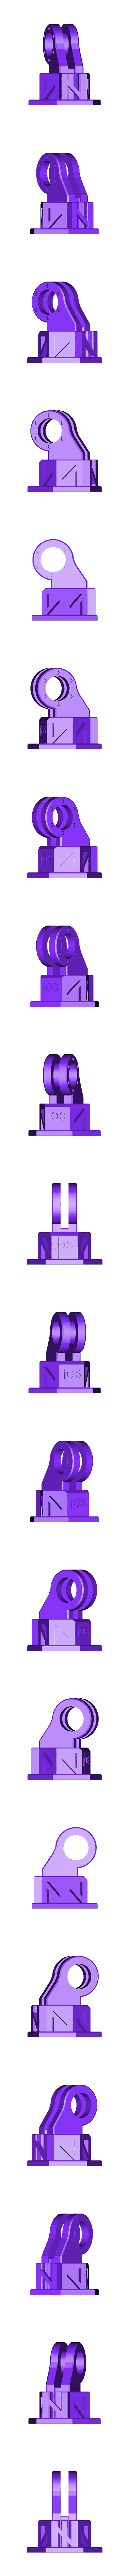 hexaspot_bottom_joint_no_nut.stl Download free STL file HexaSpot Lamp v1 • 3D printing object, marigu